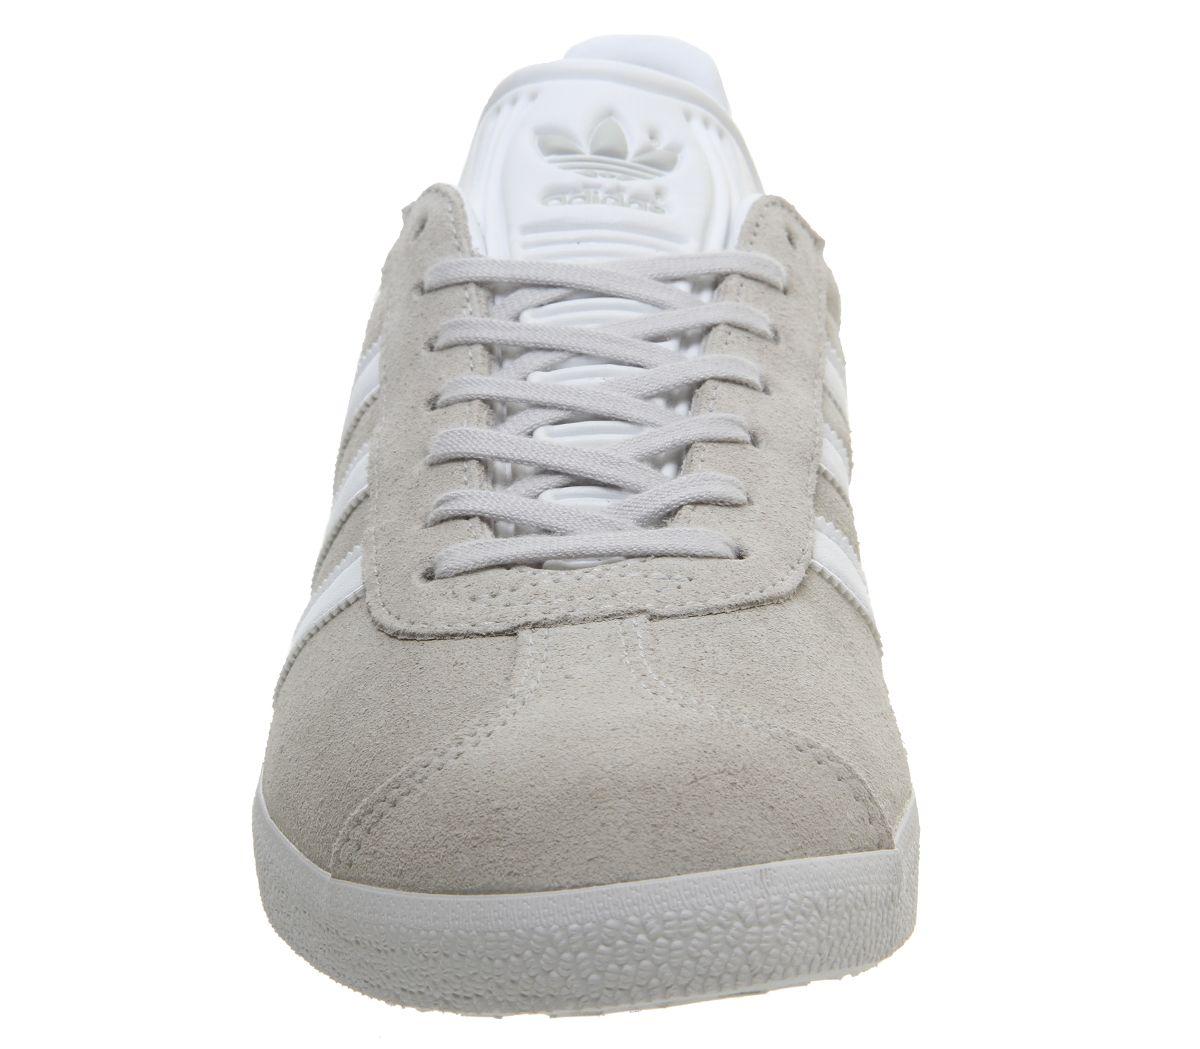 quality design ab09a 7edd3 Scarpe-da-Ginnastica-da-Uomo-Adidas-Gazelle-Nuvola-